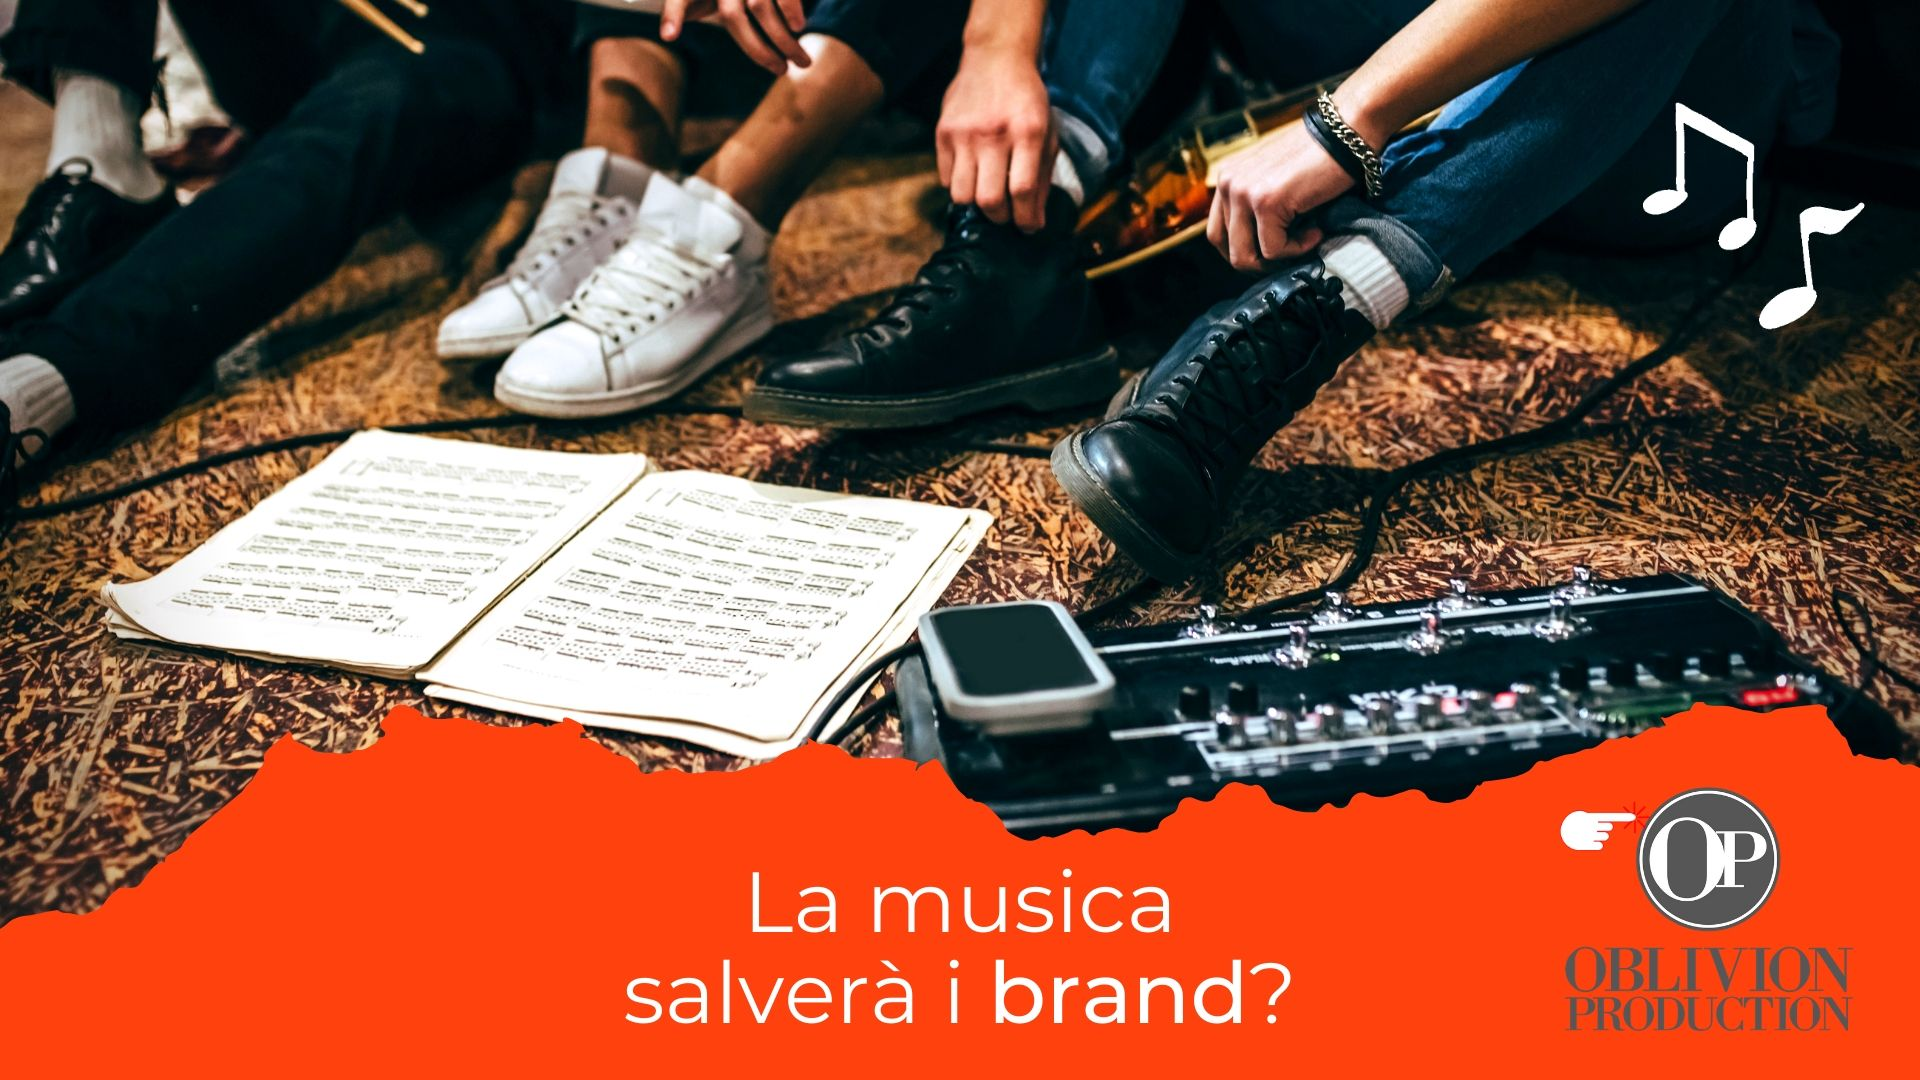 La musica salverà i brand